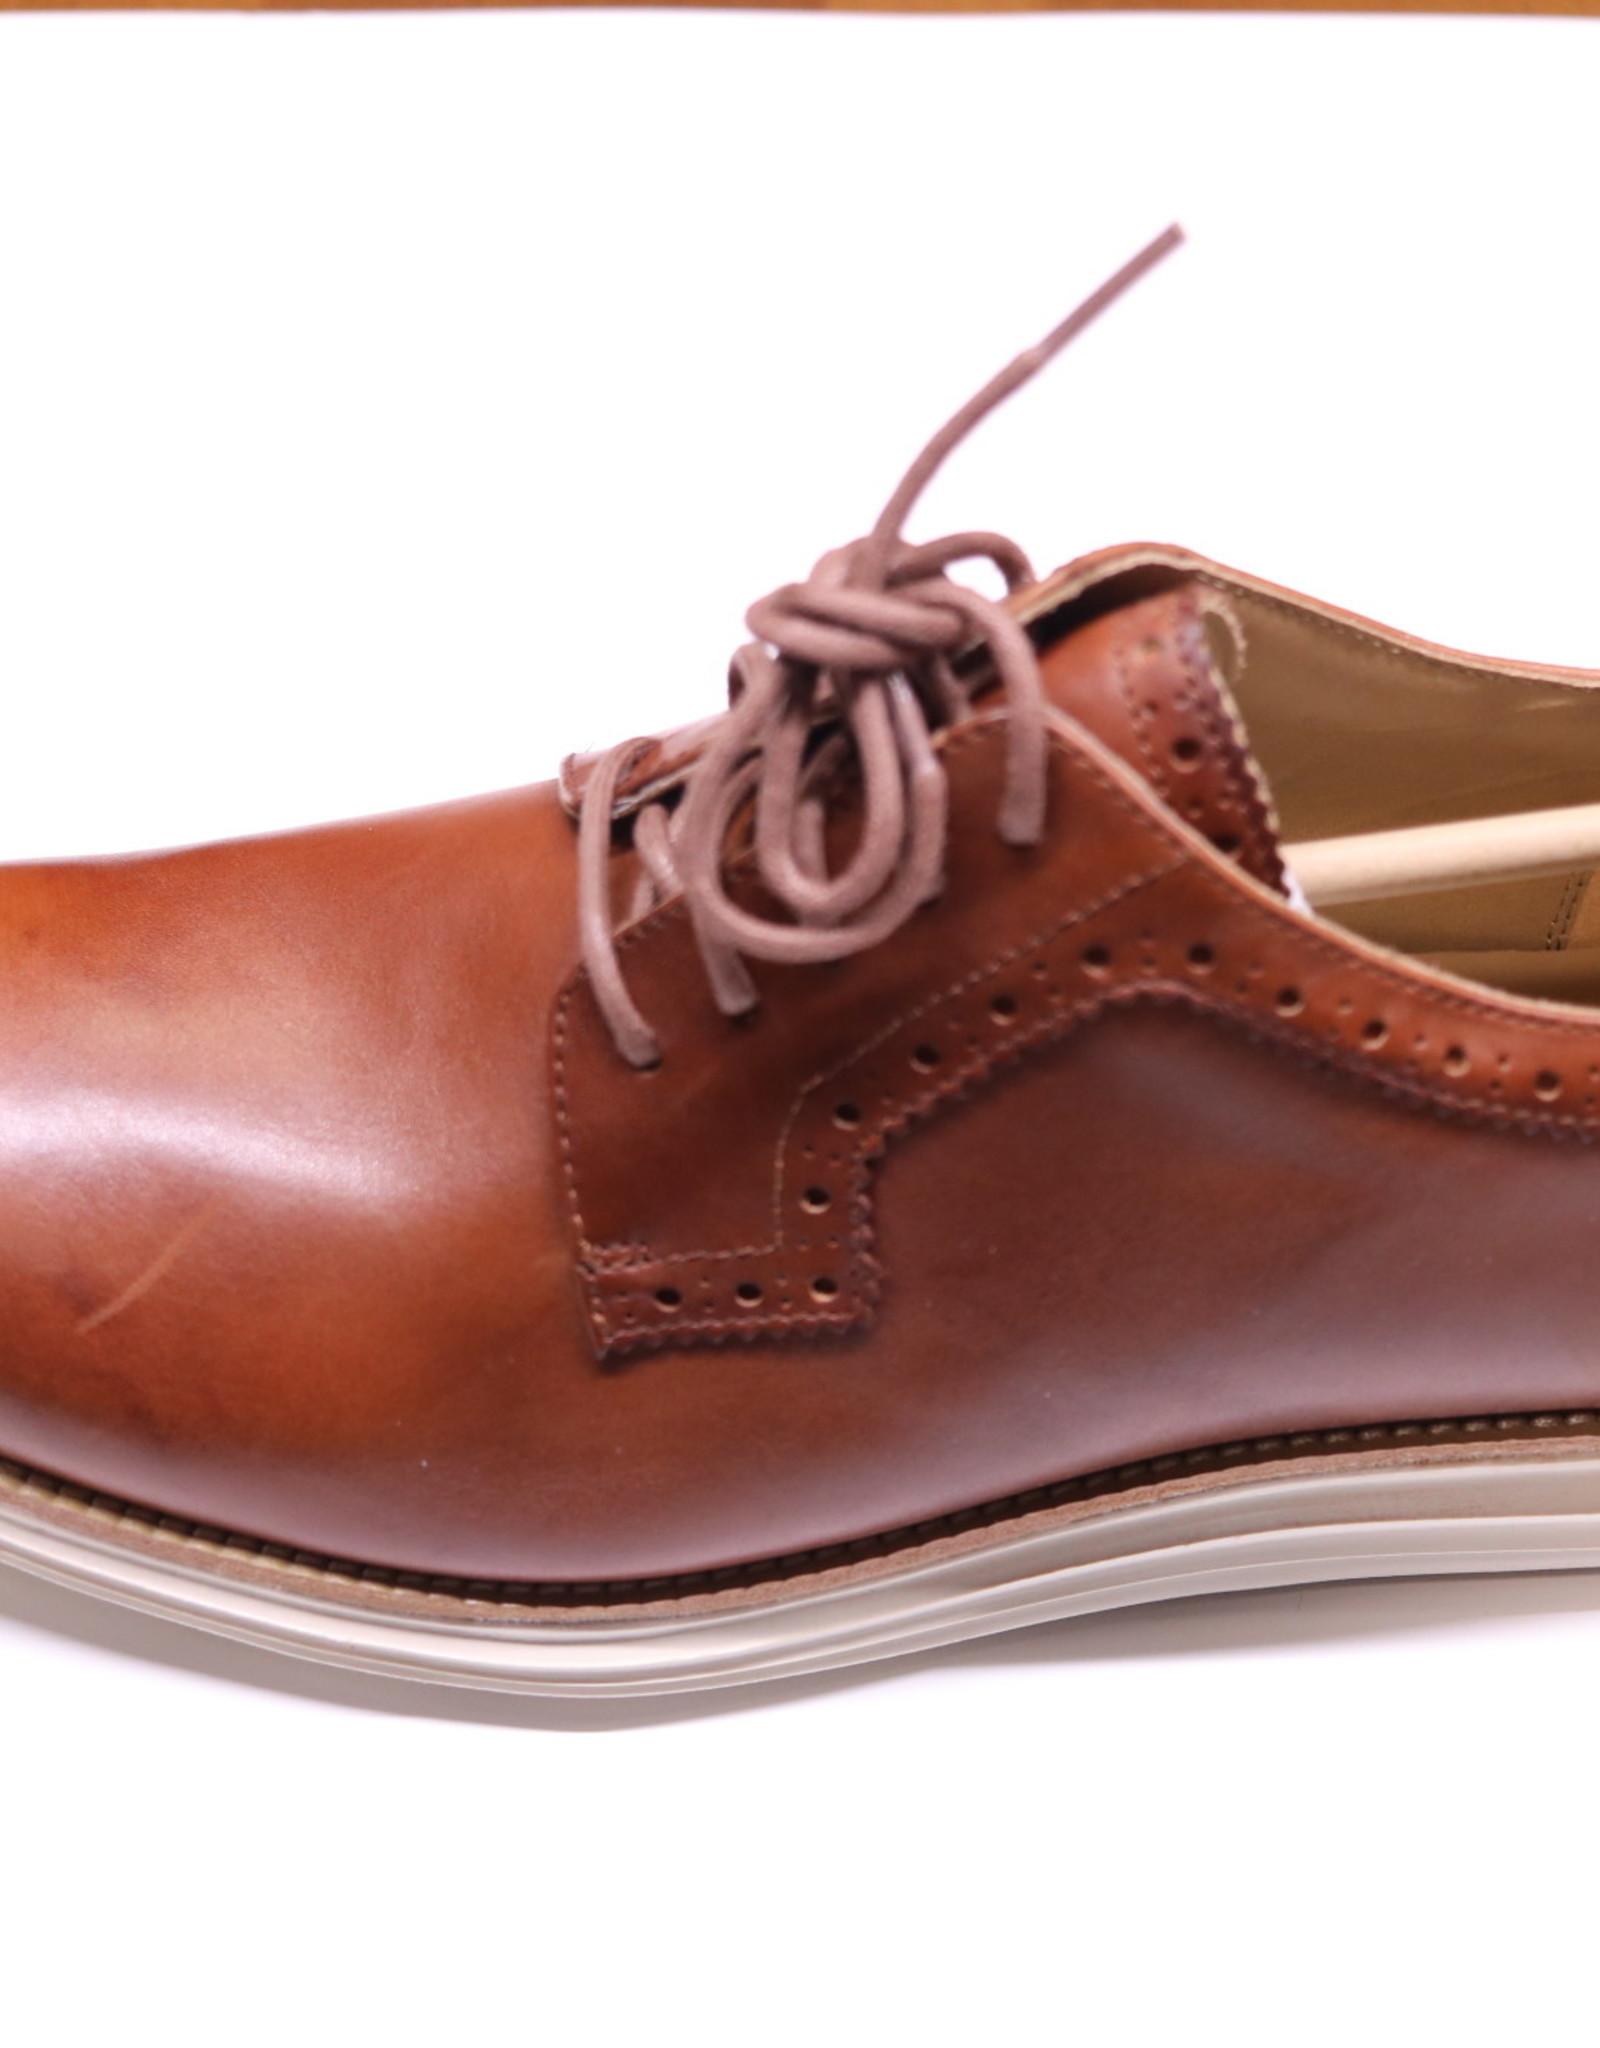 COLE HAAN C12608  Woodbury Lunargrand Plain size 12 Reg $230